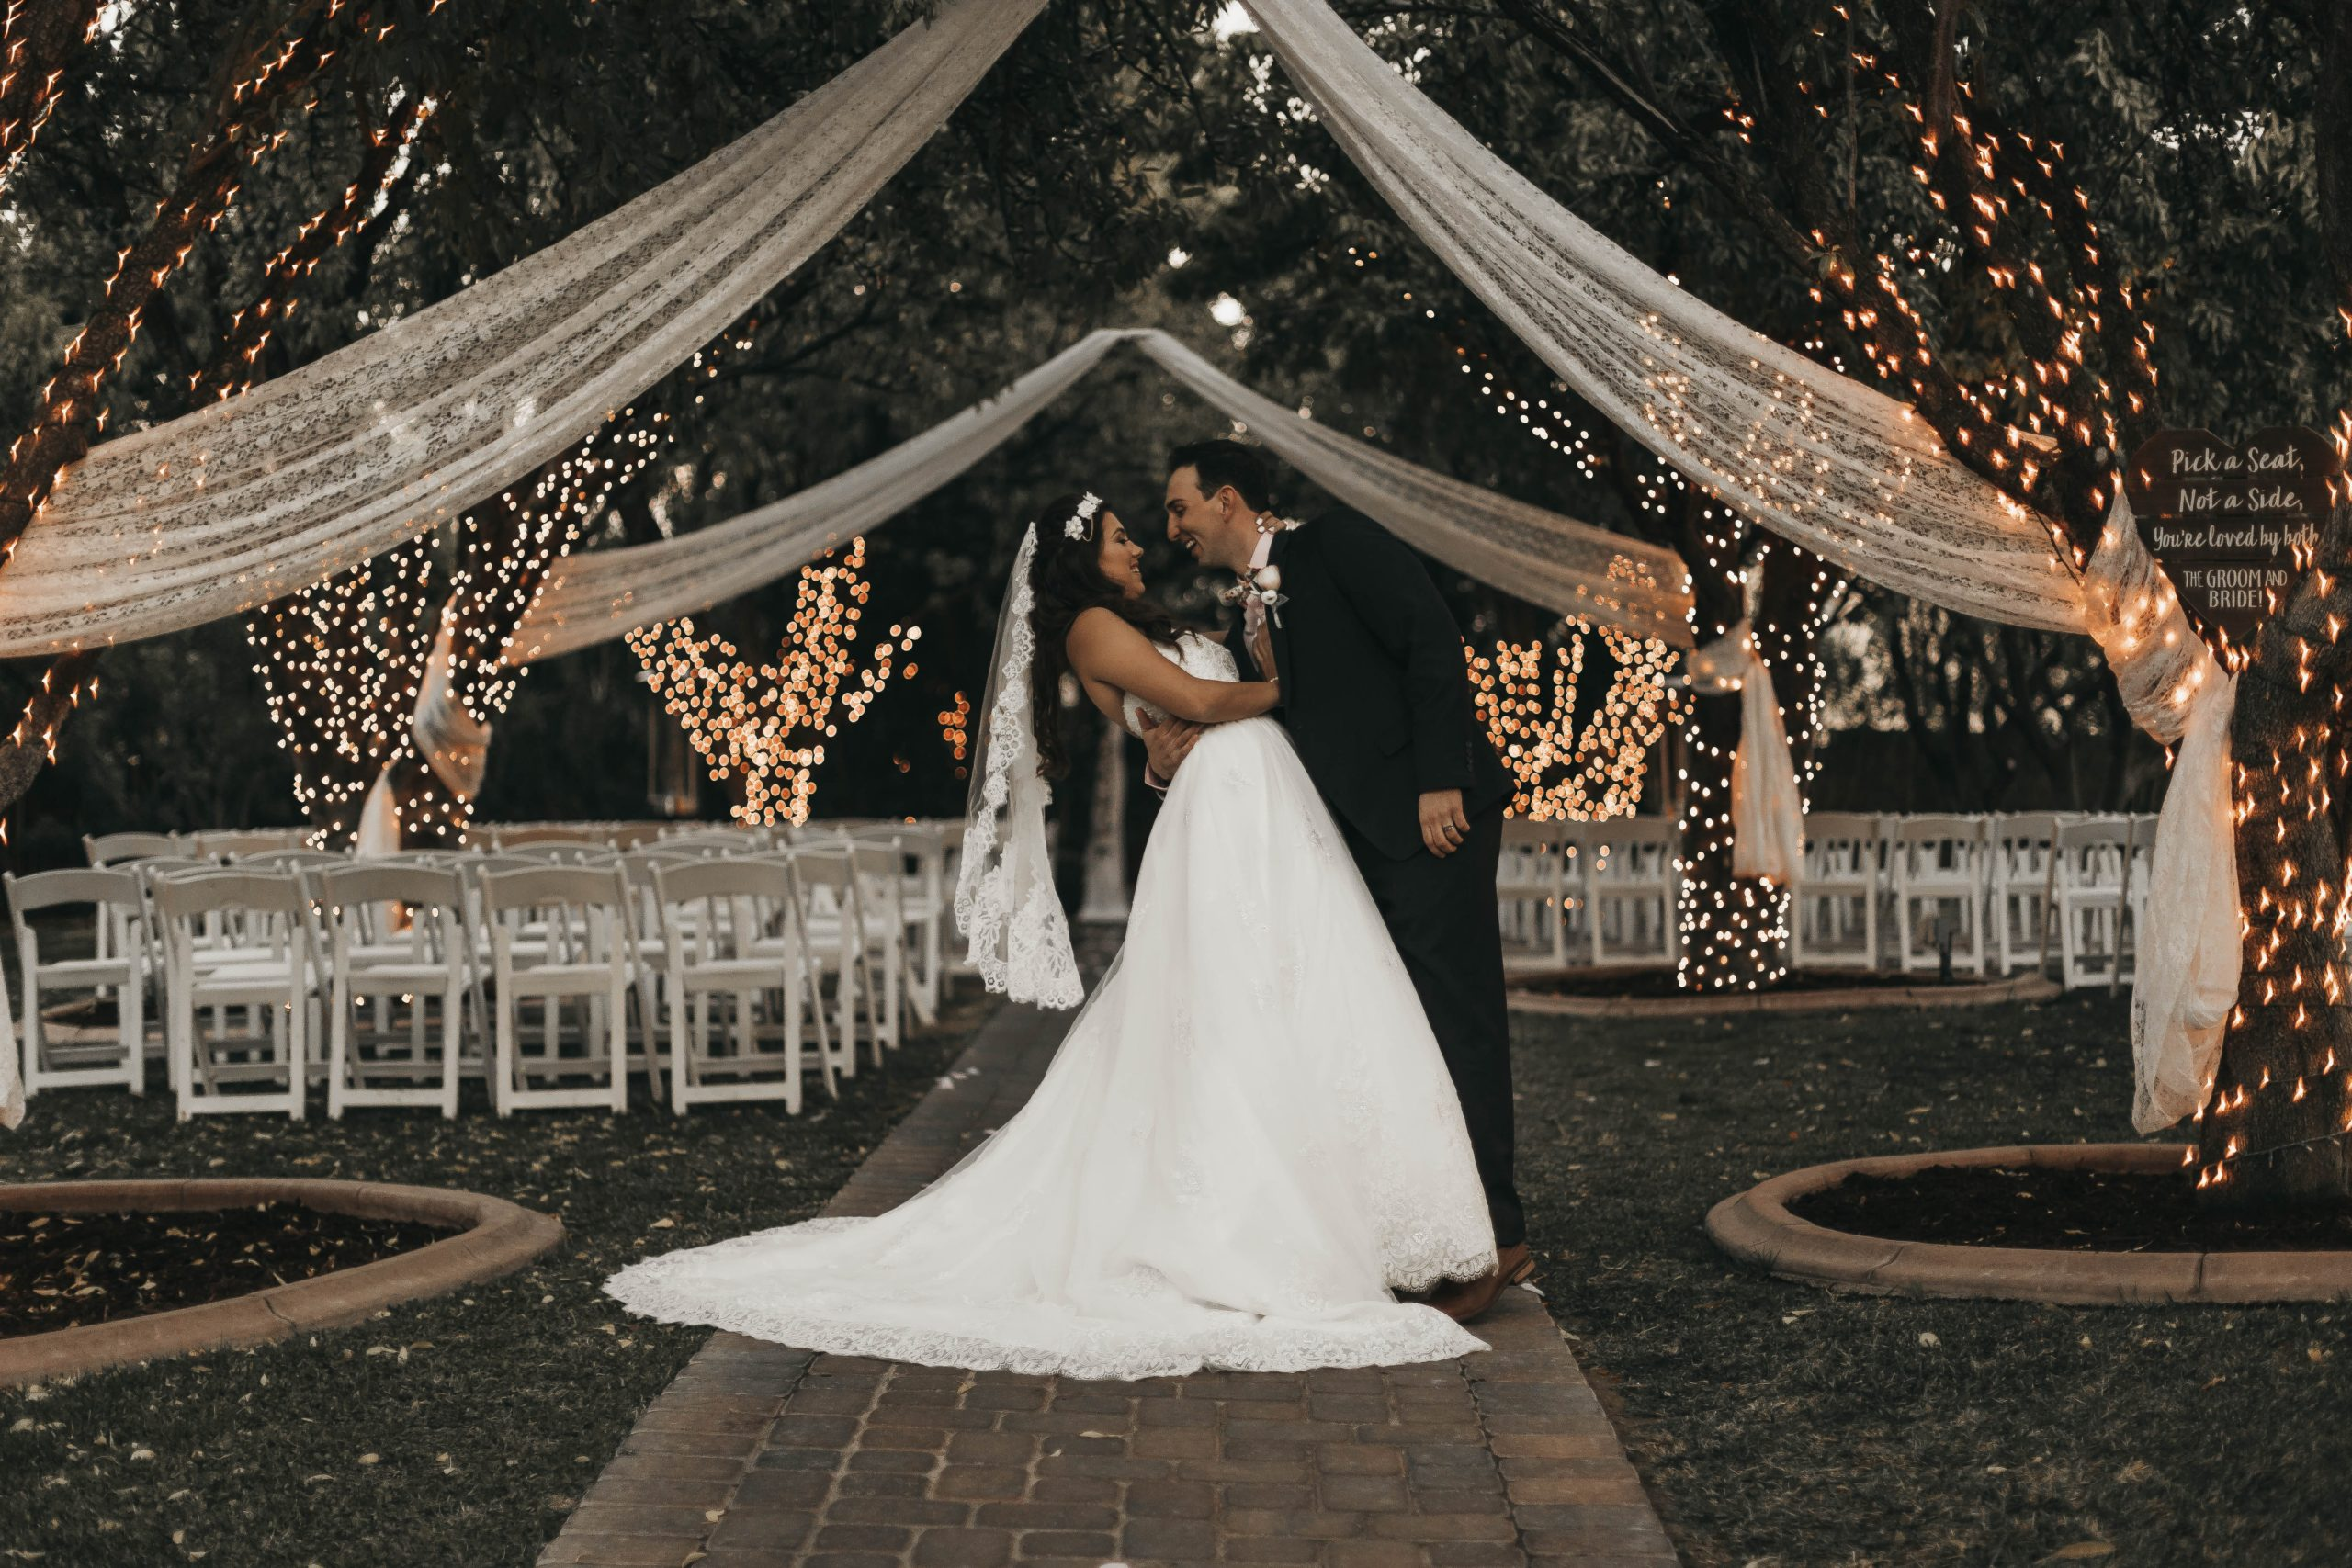 Wedding Picture 1